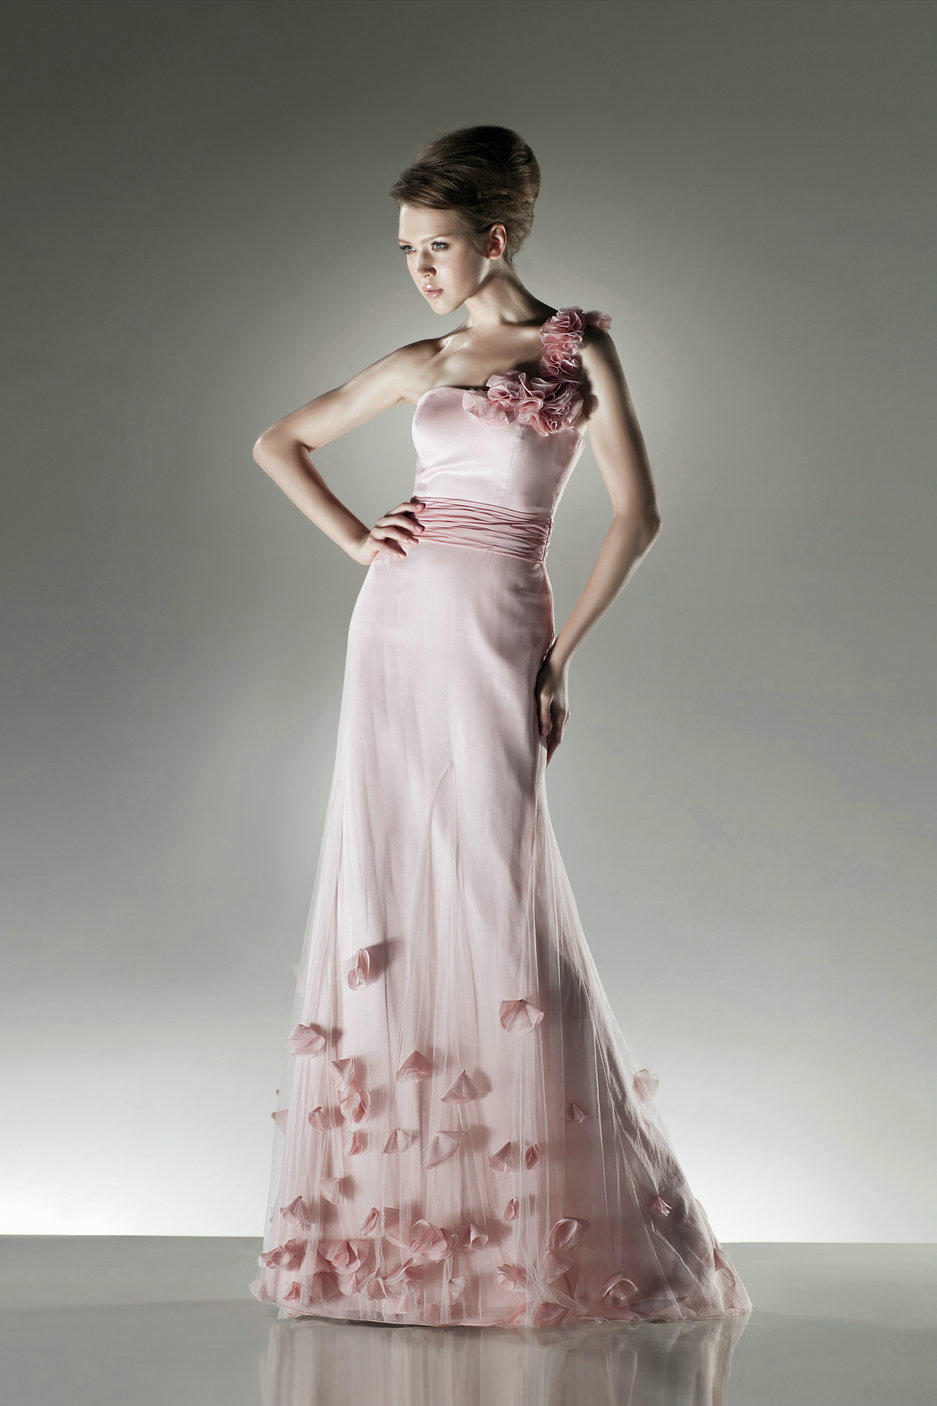 WhiteAzalea Evening Dresses: Evening Dresses with Floral